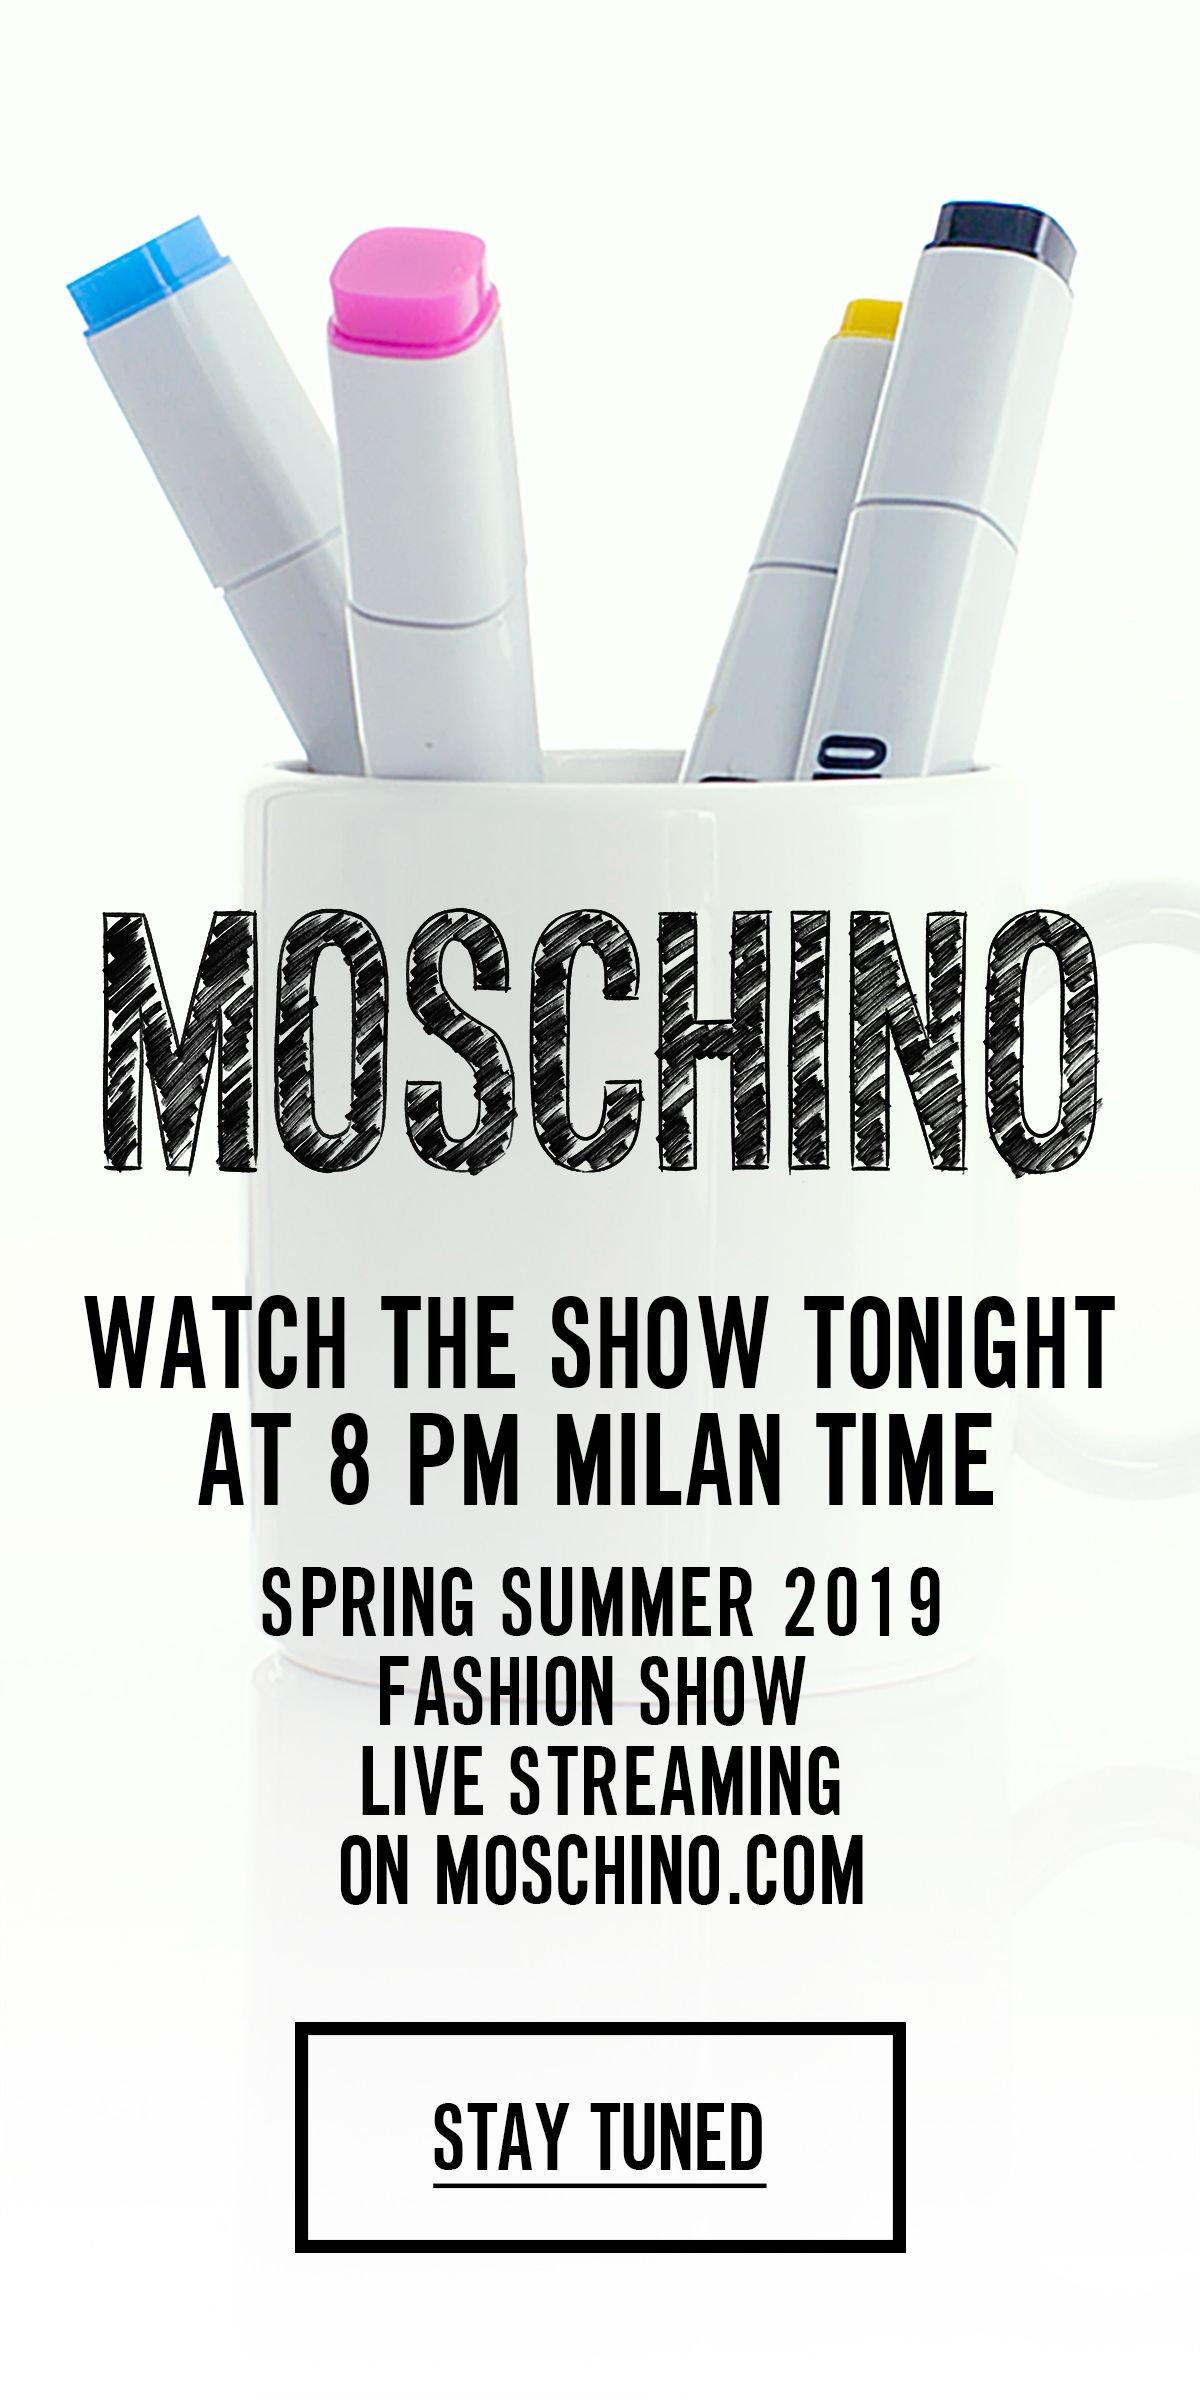 Fashion Show Live streaming